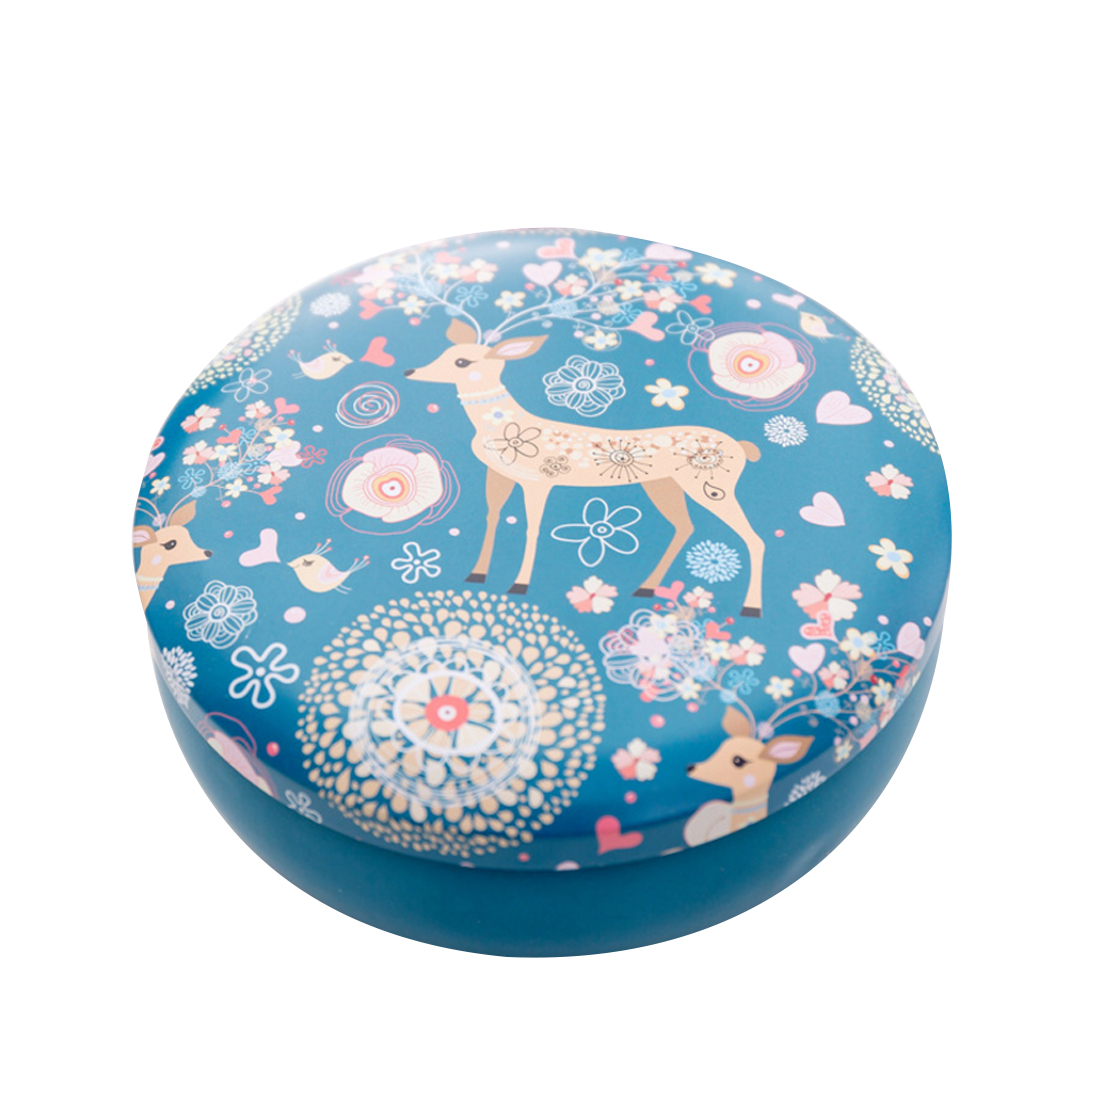 iTECHOR Tinplate Round Storage Box with Lid Jewelry Organizer Gift Box Tea Candy Storage Box Kitchen